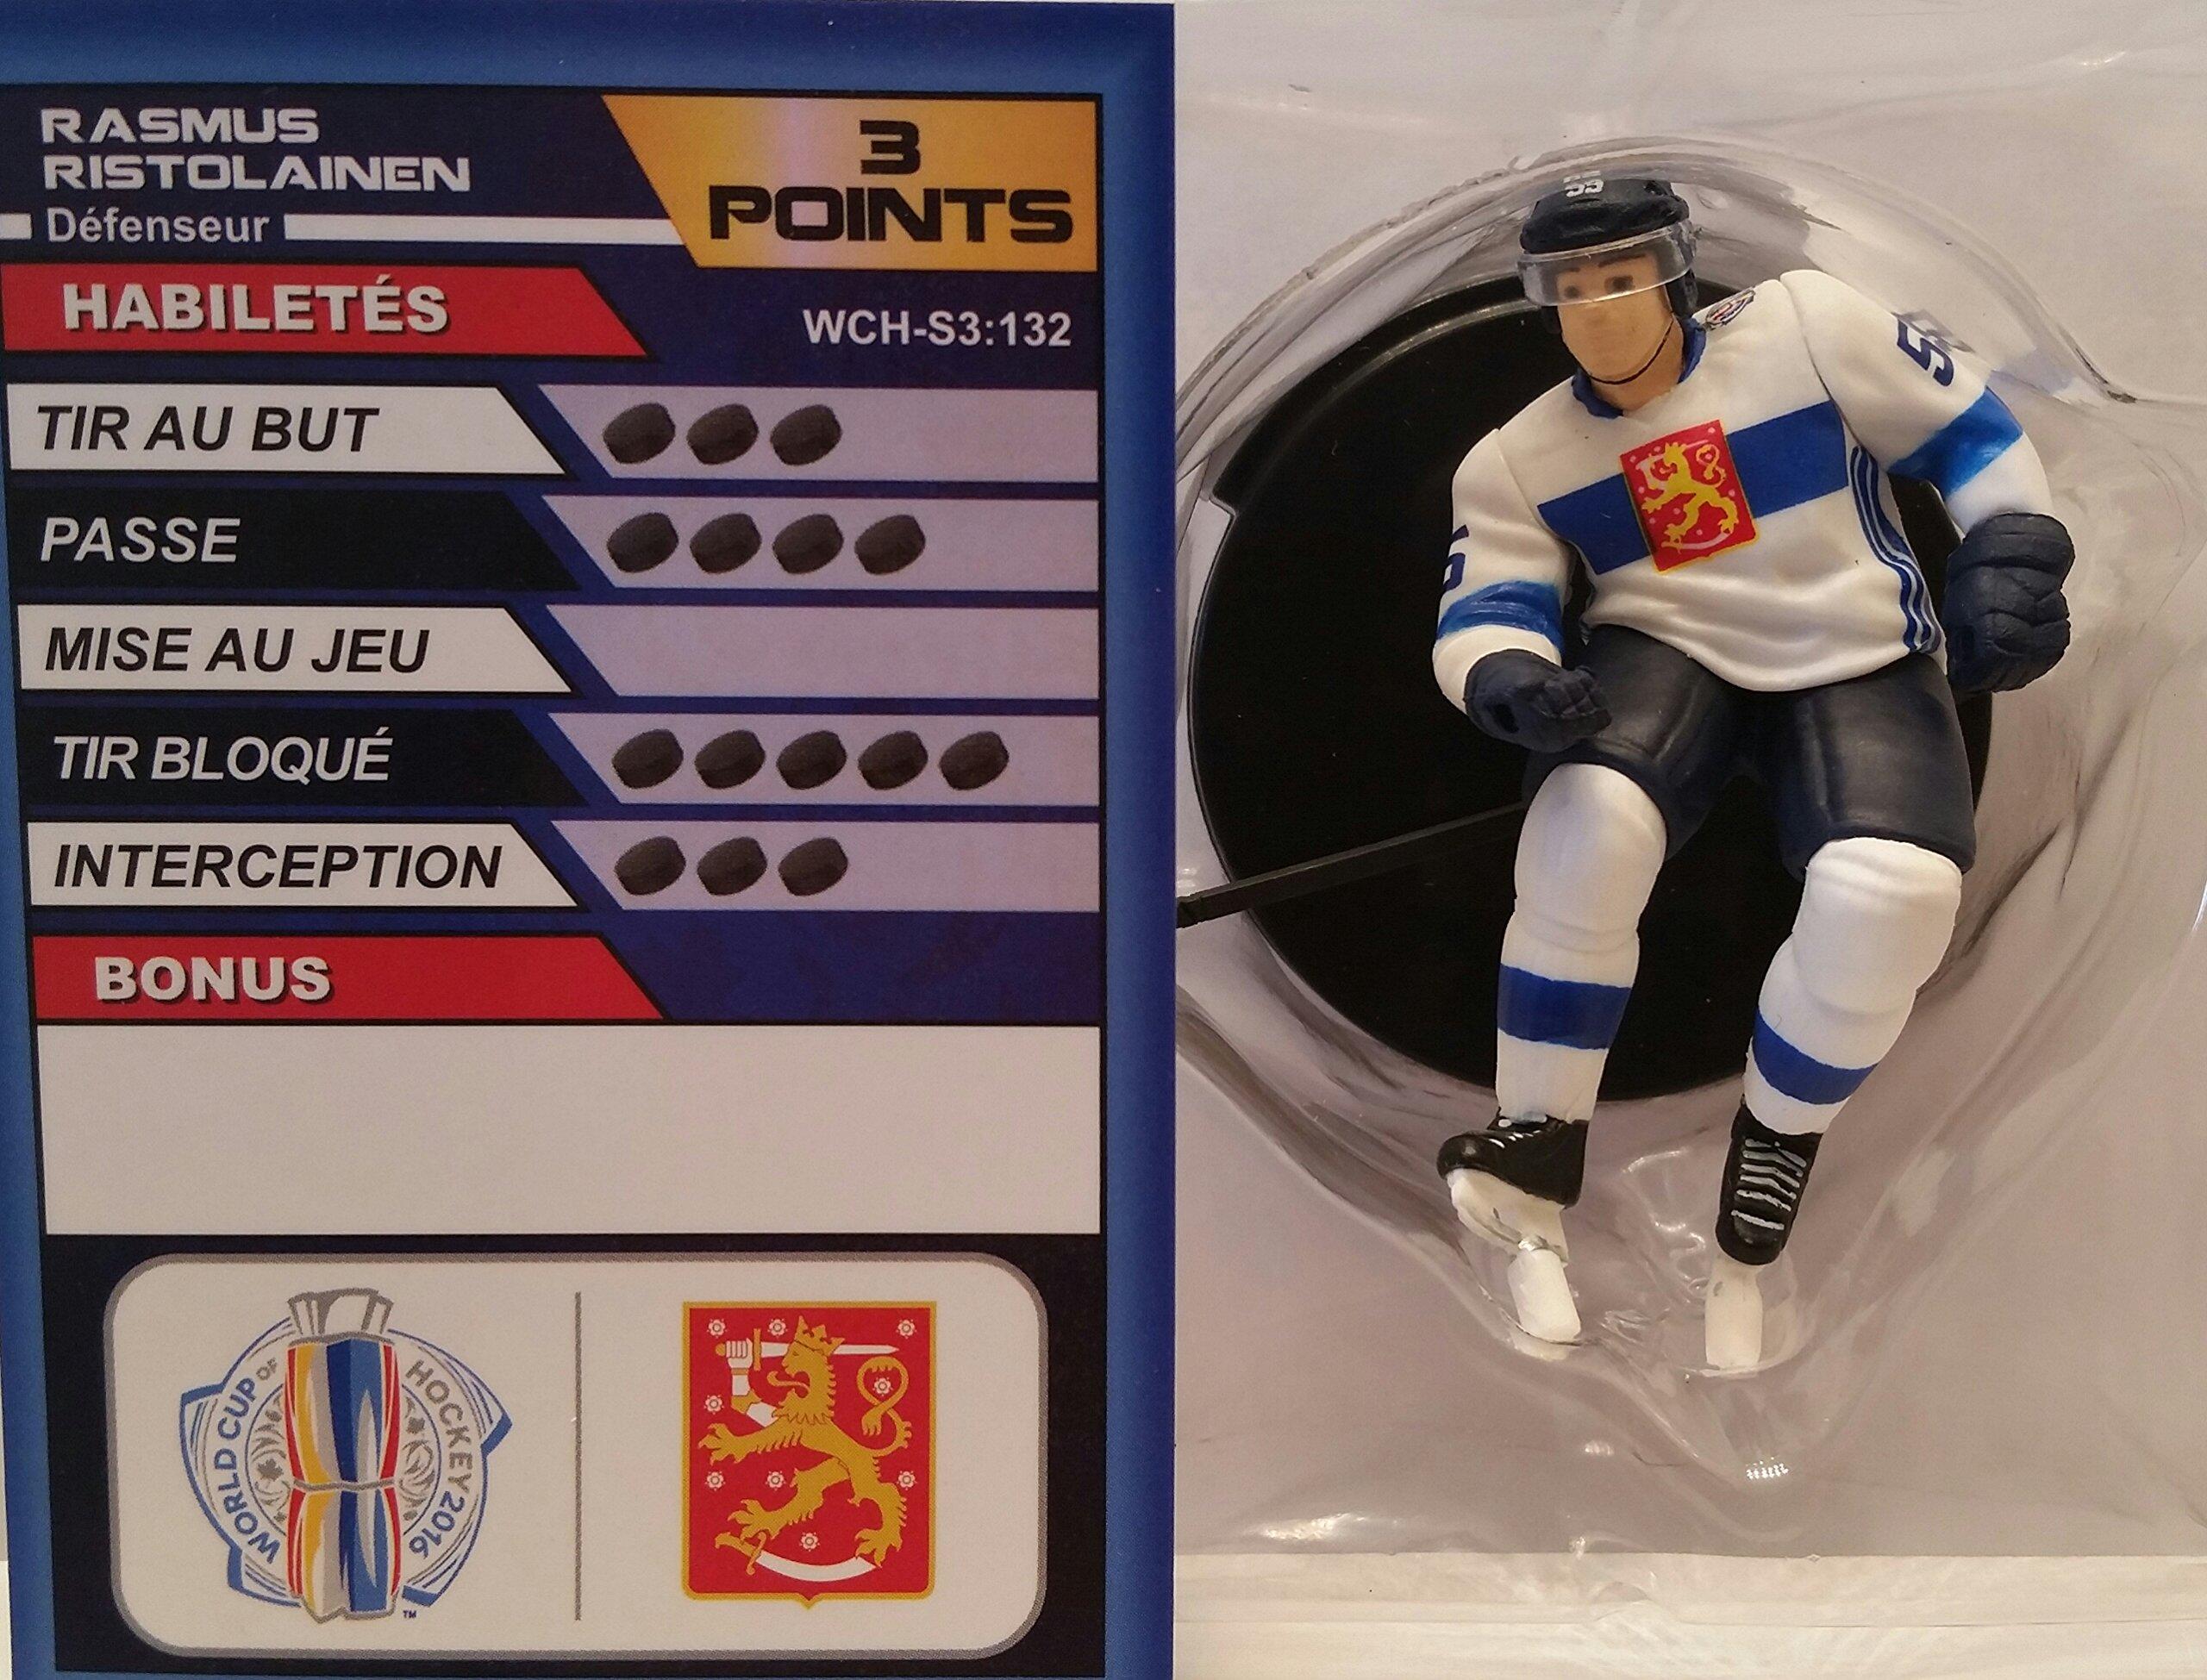 World Cup of Hockey Team Finland Rasmus Ristolainen (Common)